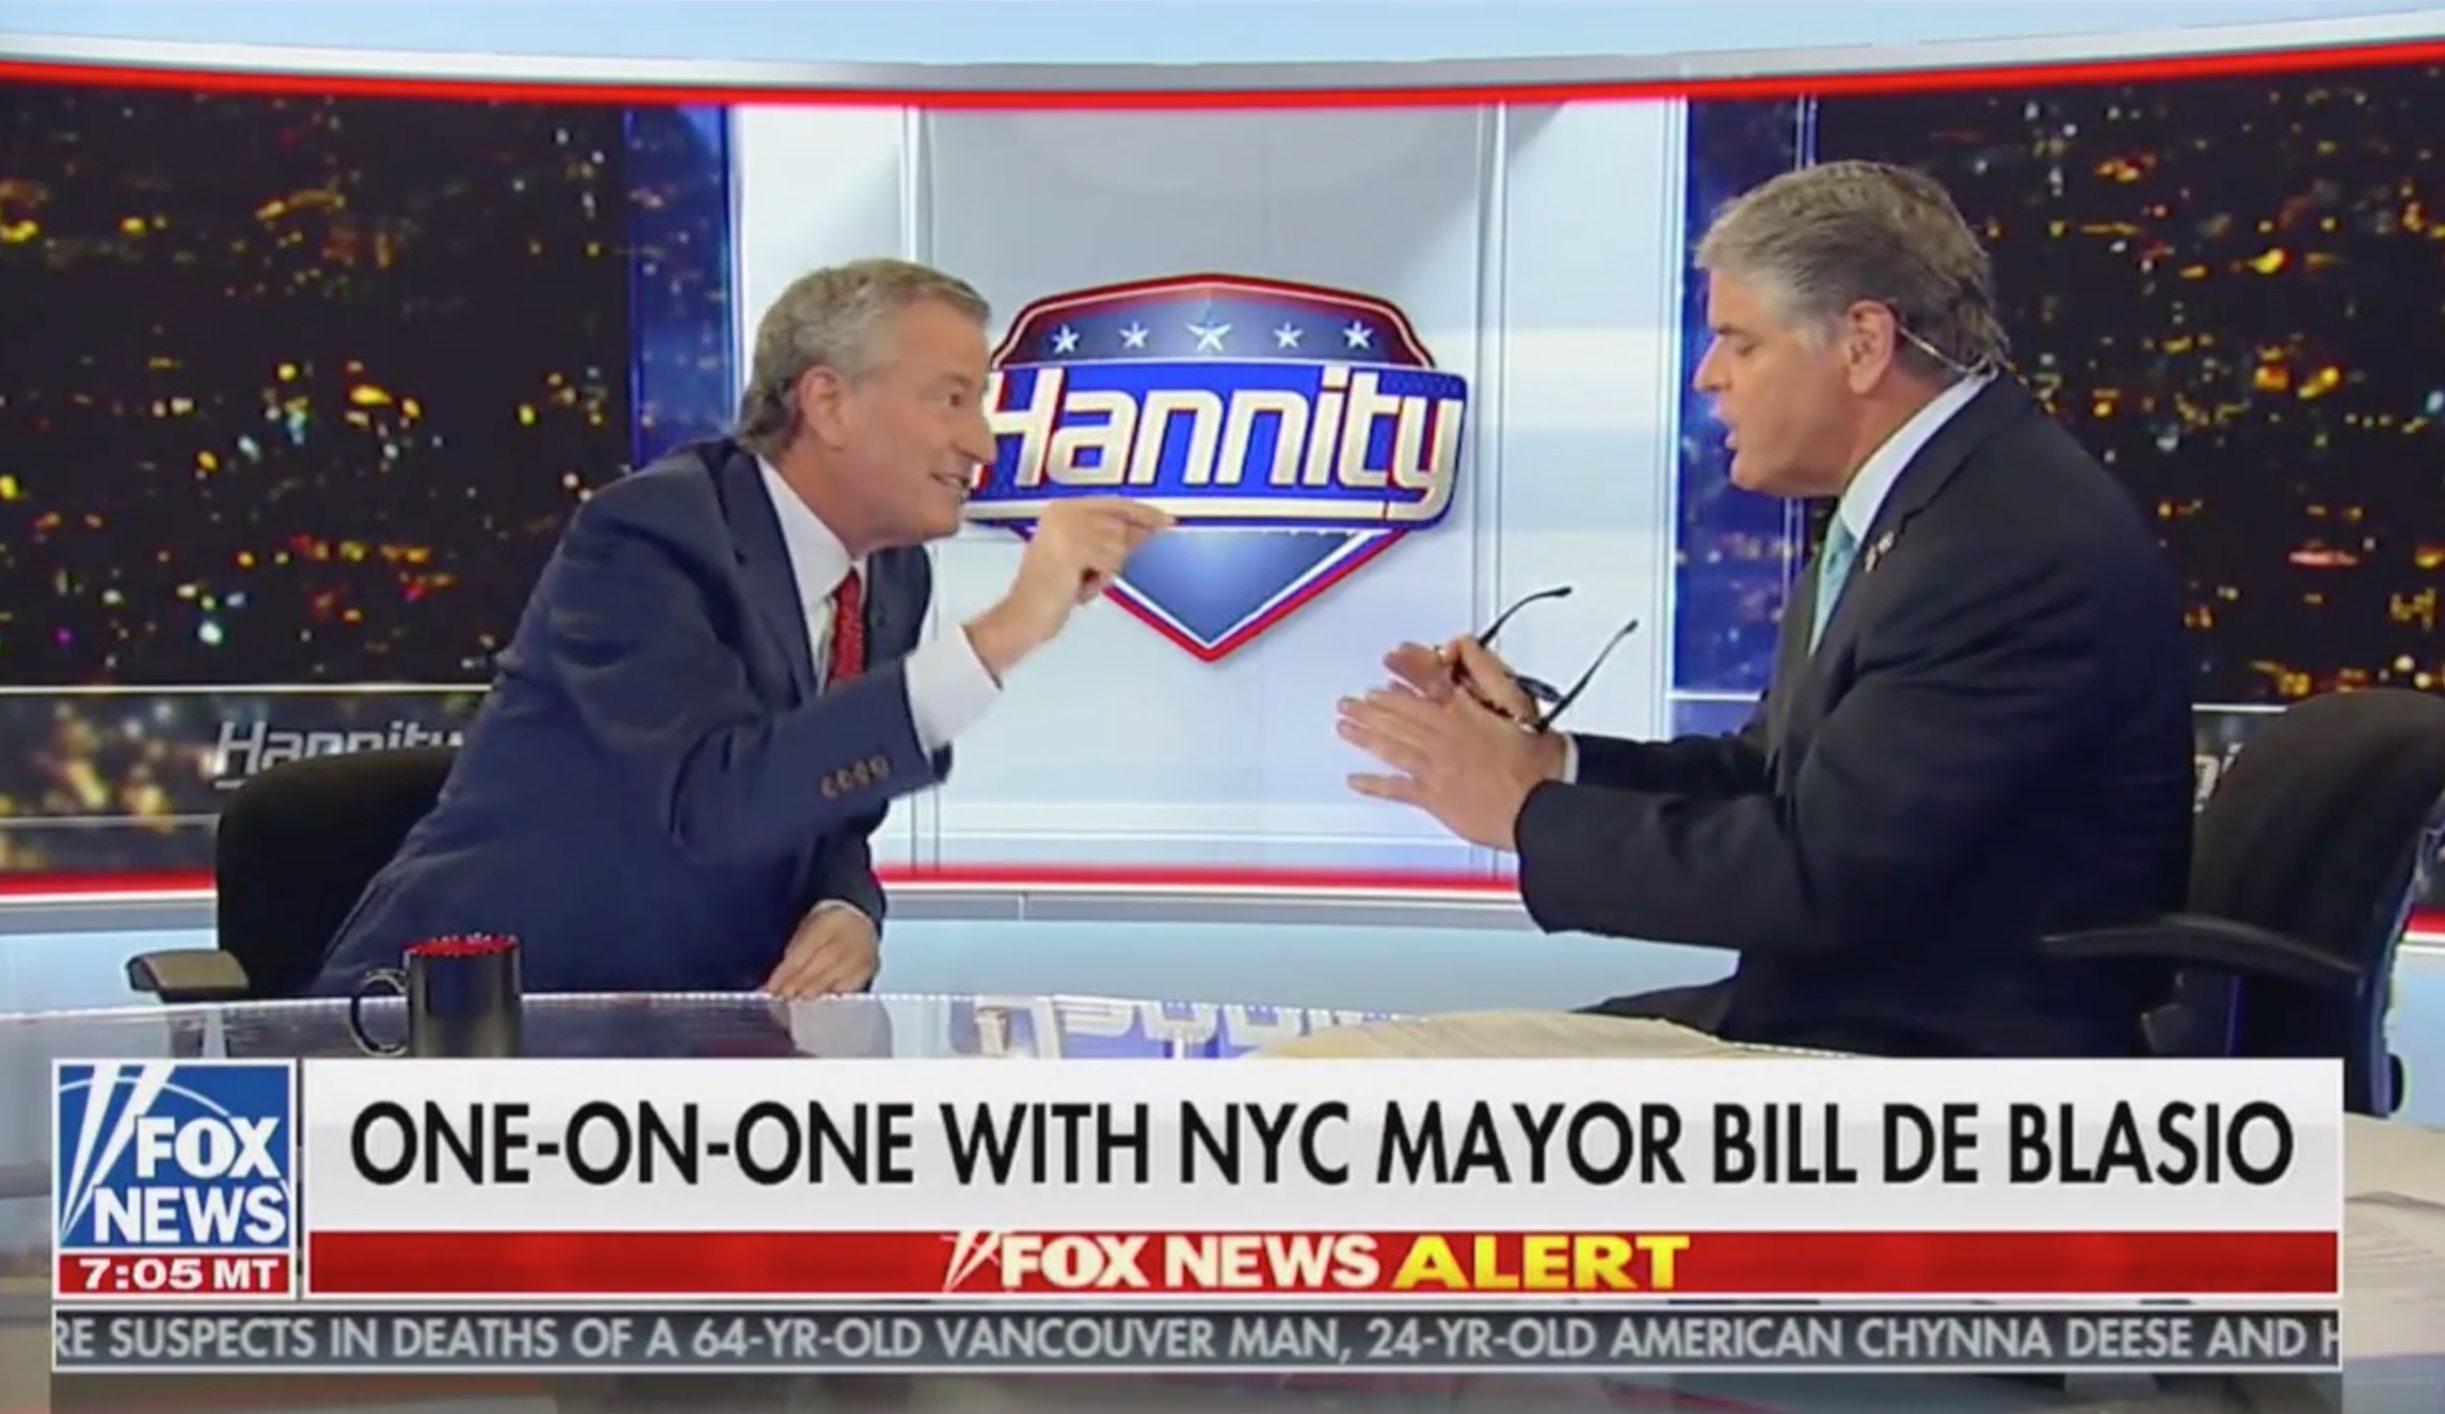 De Blasio on Hannity Shows Why Democrats Should go on Fox News